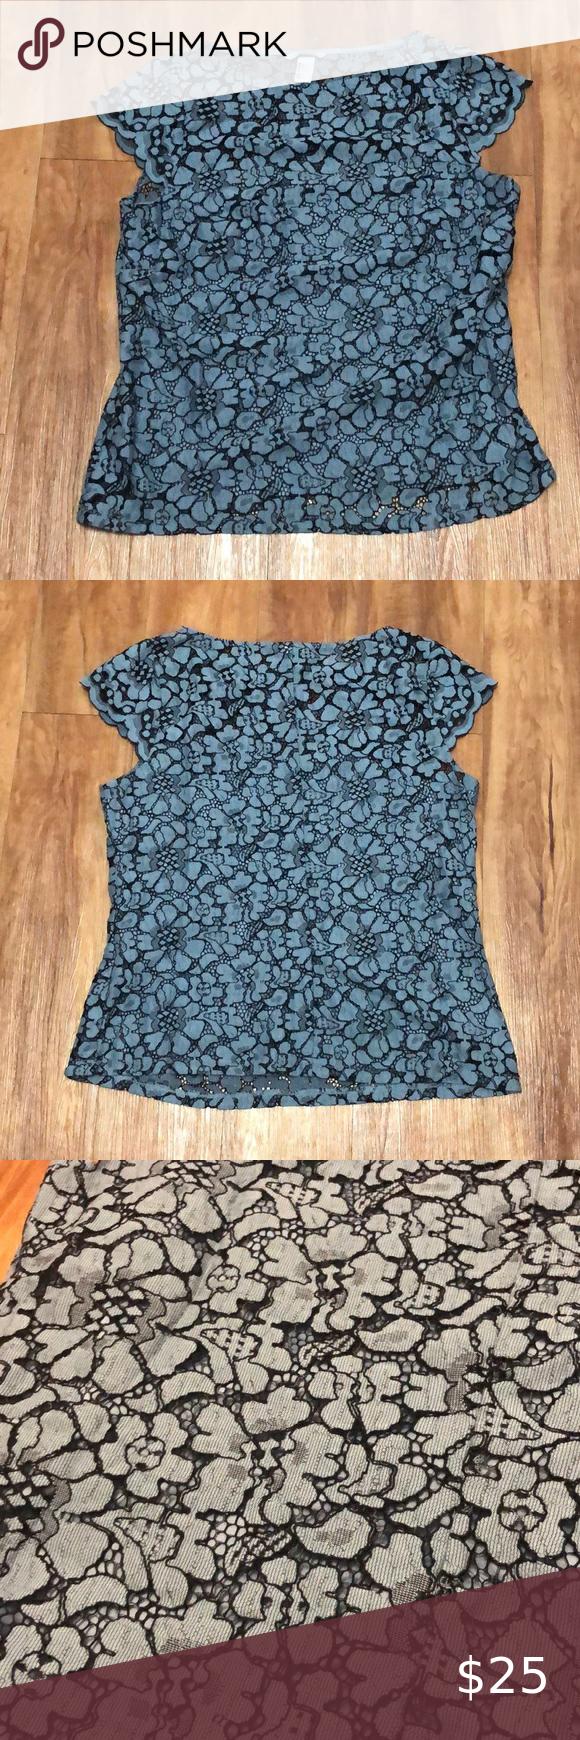 H M Blue Floral Lace Top Size Large In 2020 Floral Lace Tops Clothes Design Fashion